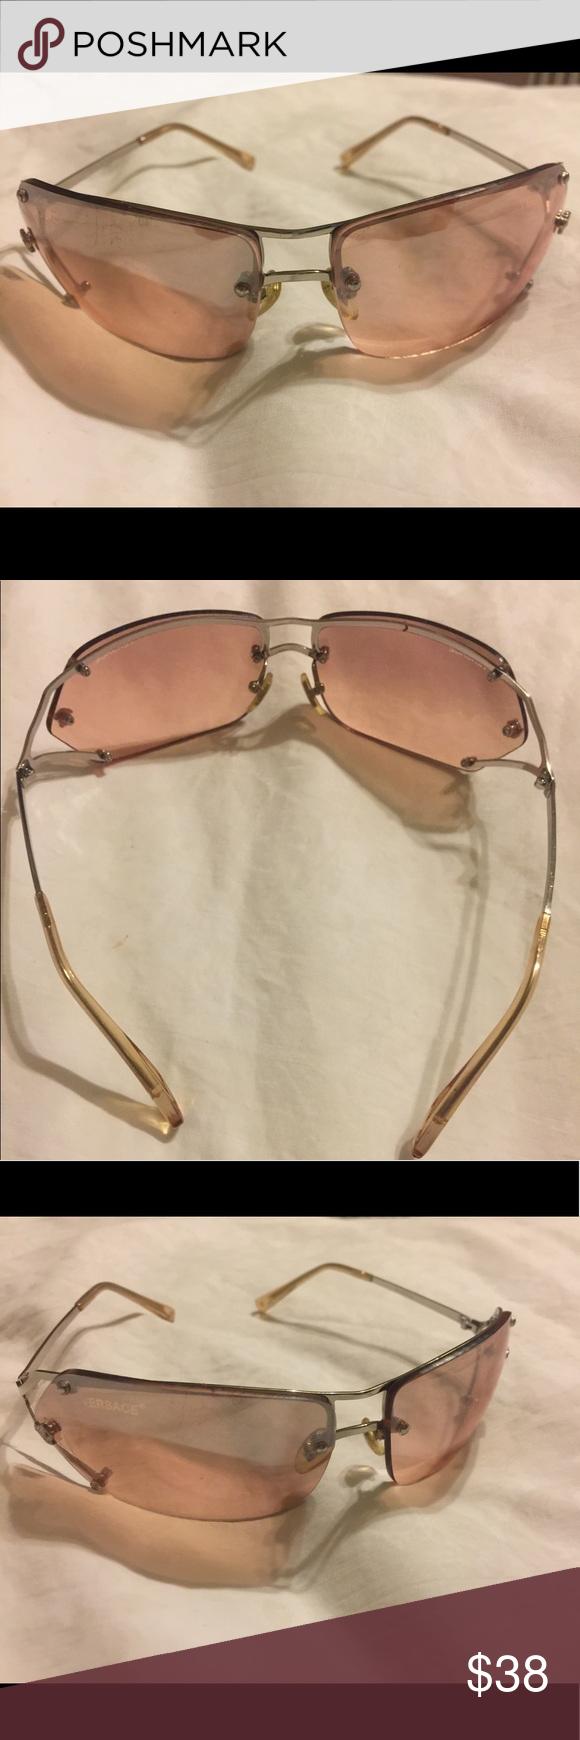 Retro Versace 90s Jlo Clear Frameless Sunglasses Frameless Sunglasses Sunglasses Versace